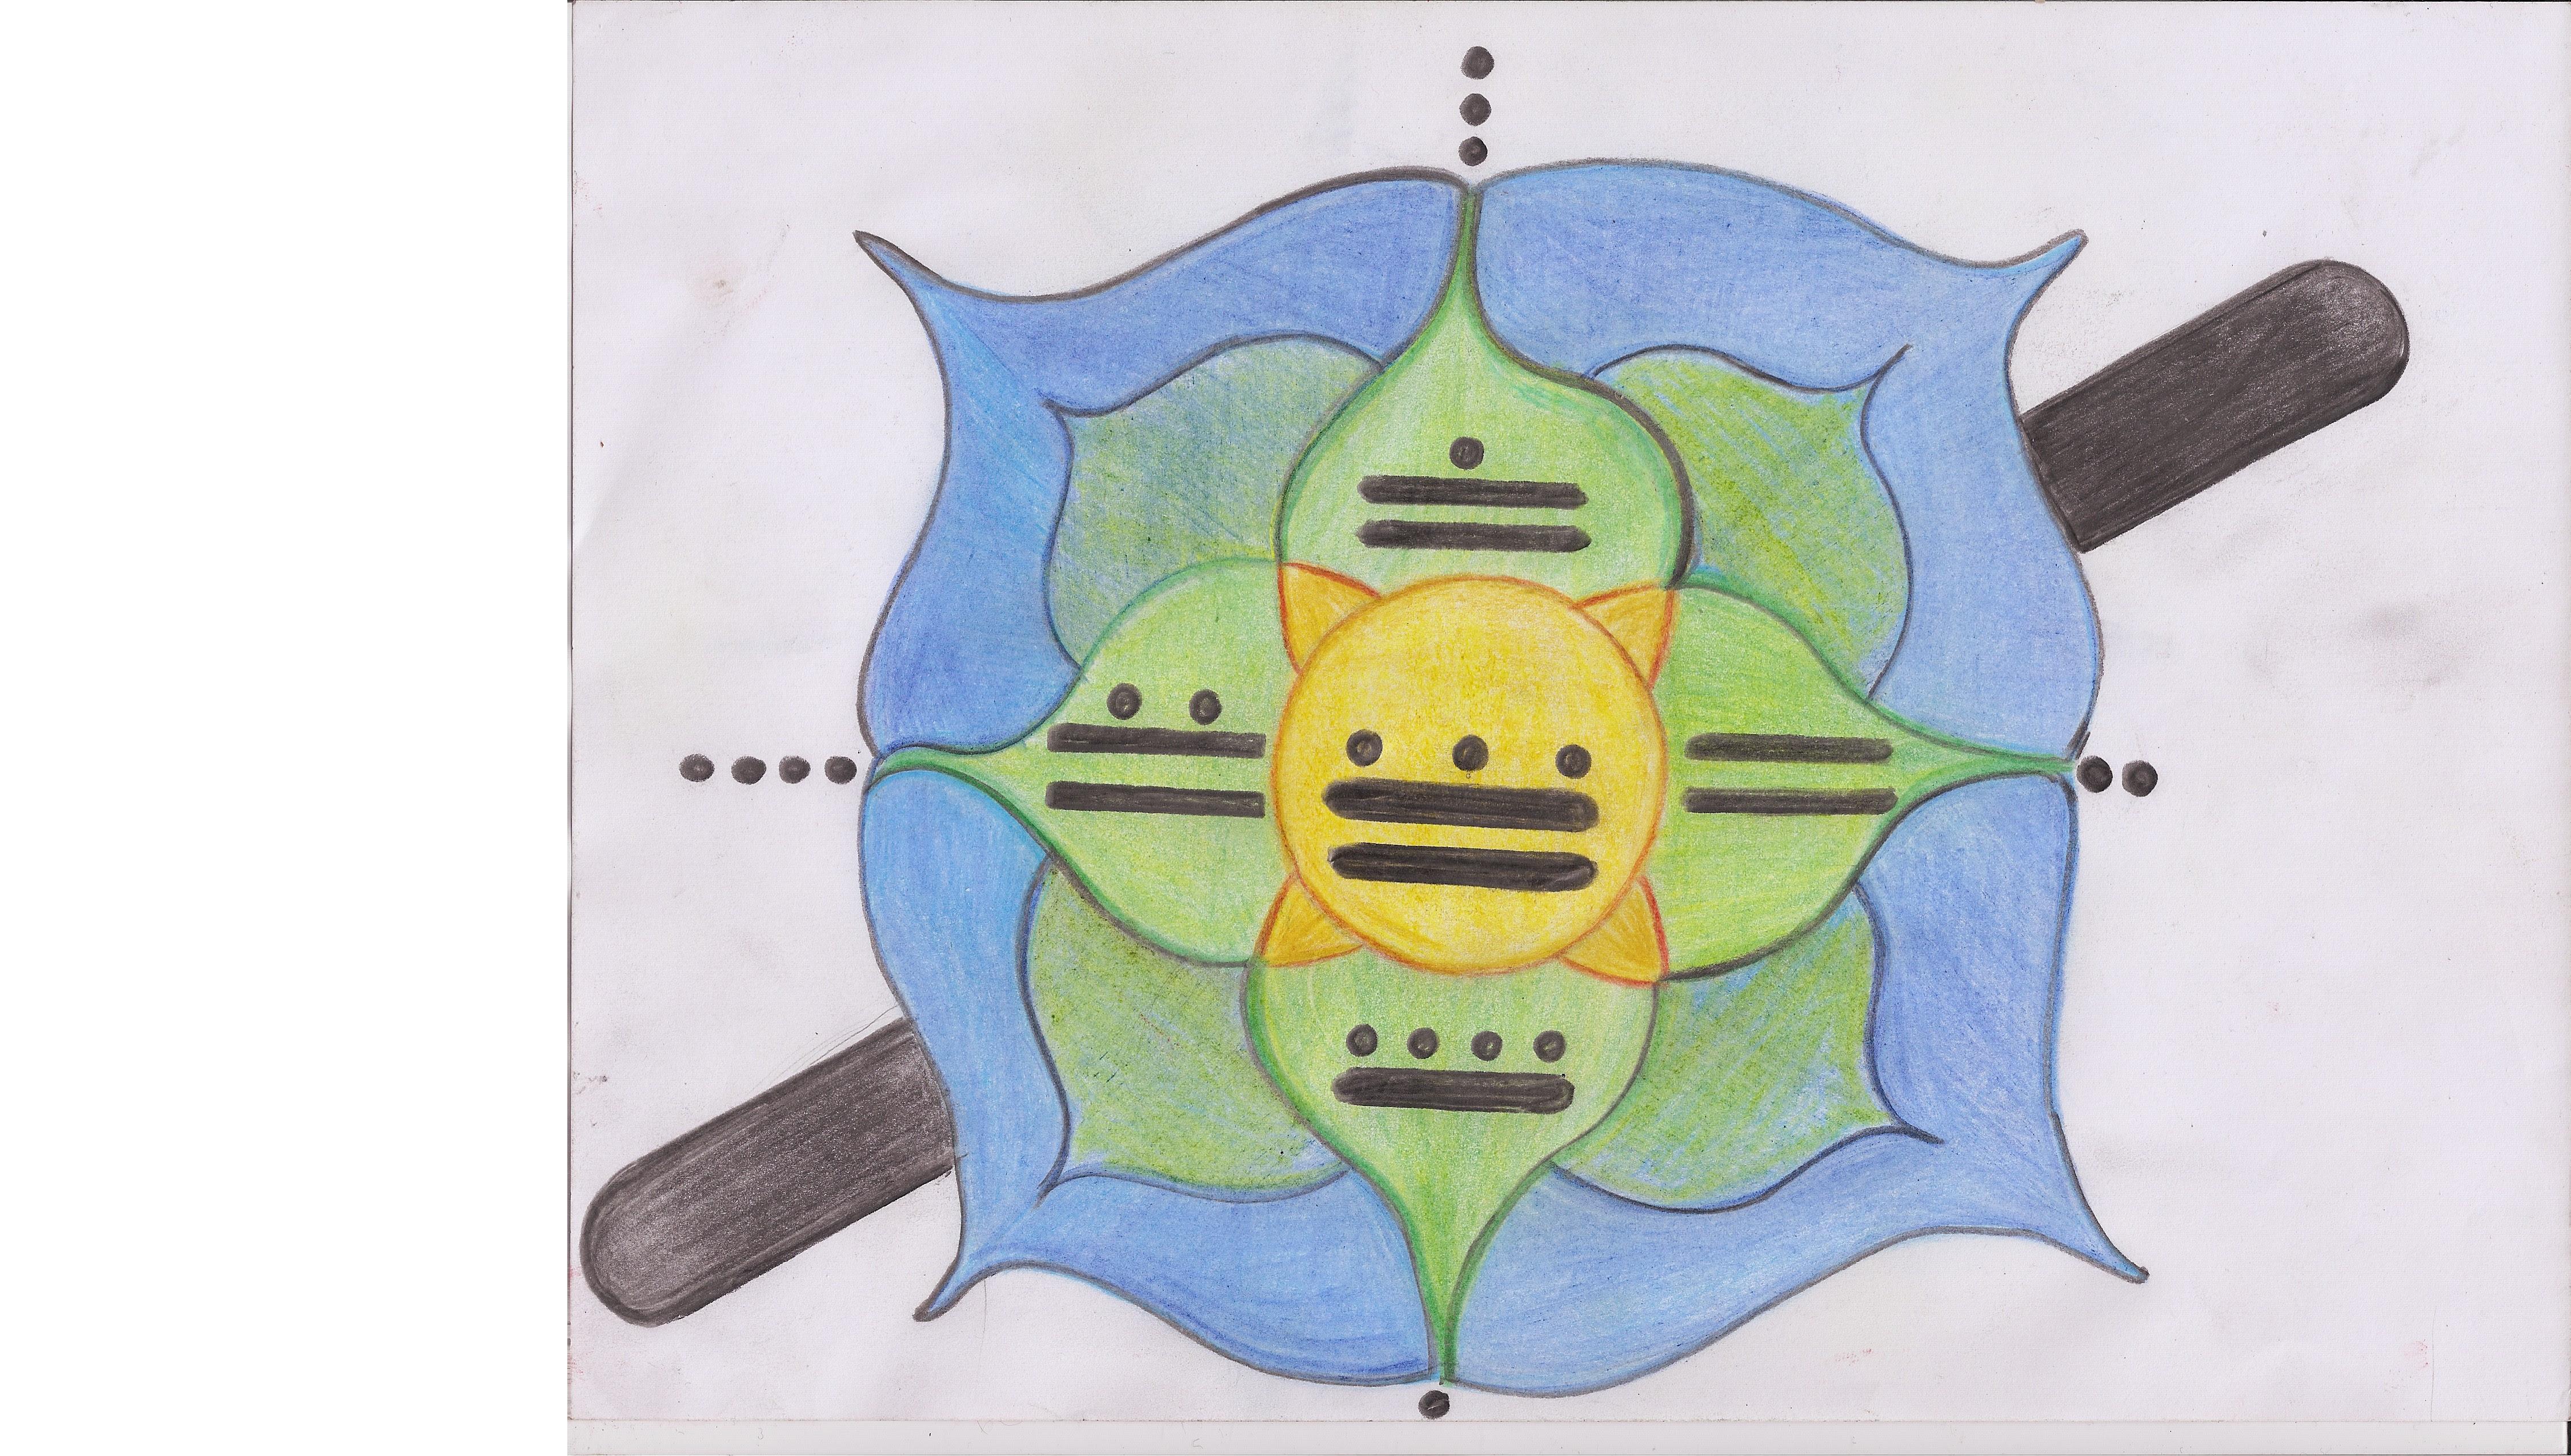 nucleo celula cosmica maya